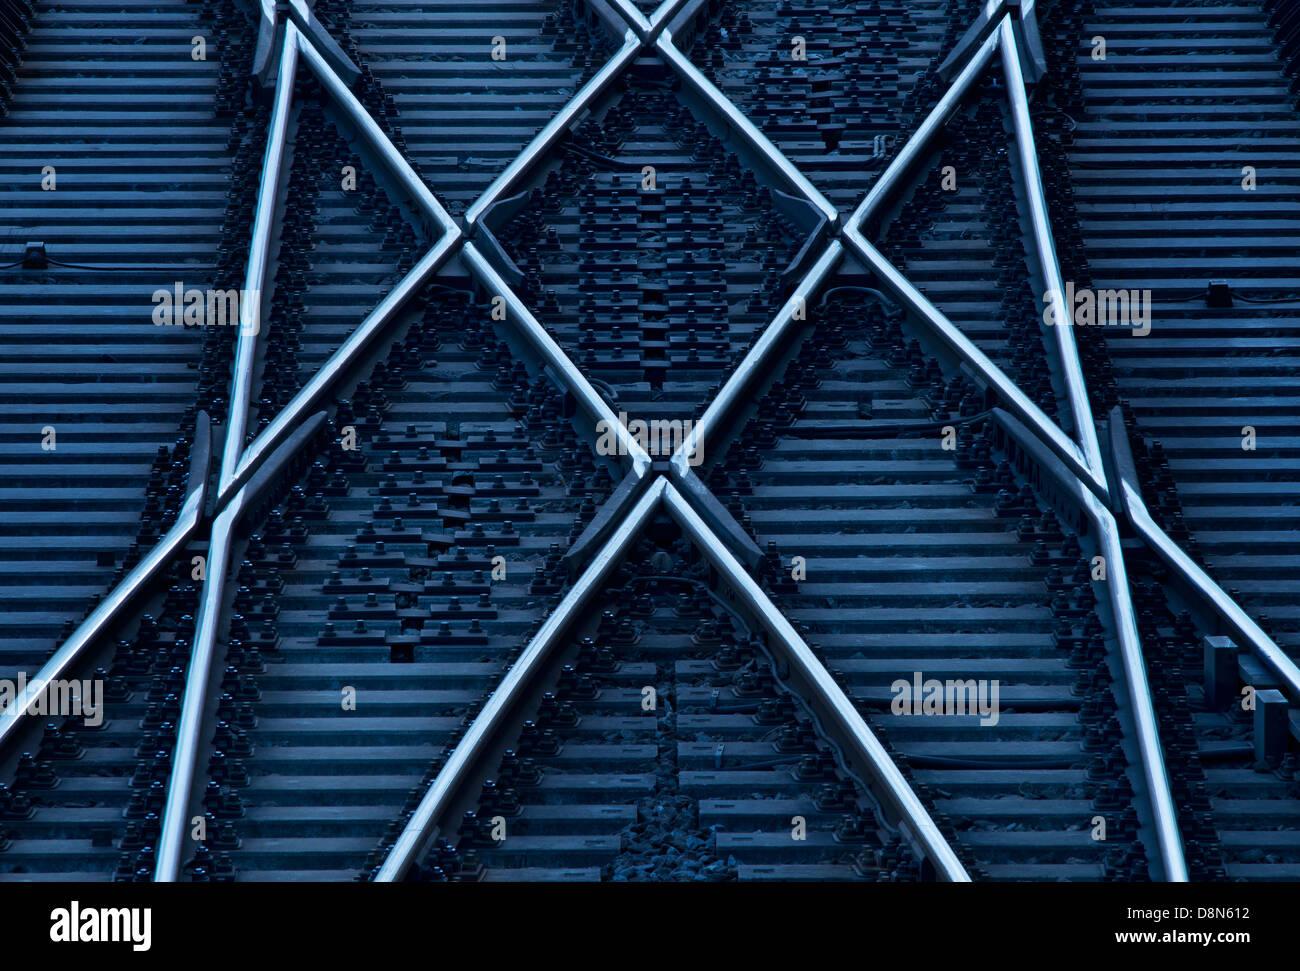 Crossing railway tracks. Rotterdam, The Netherlands. - Stock Image